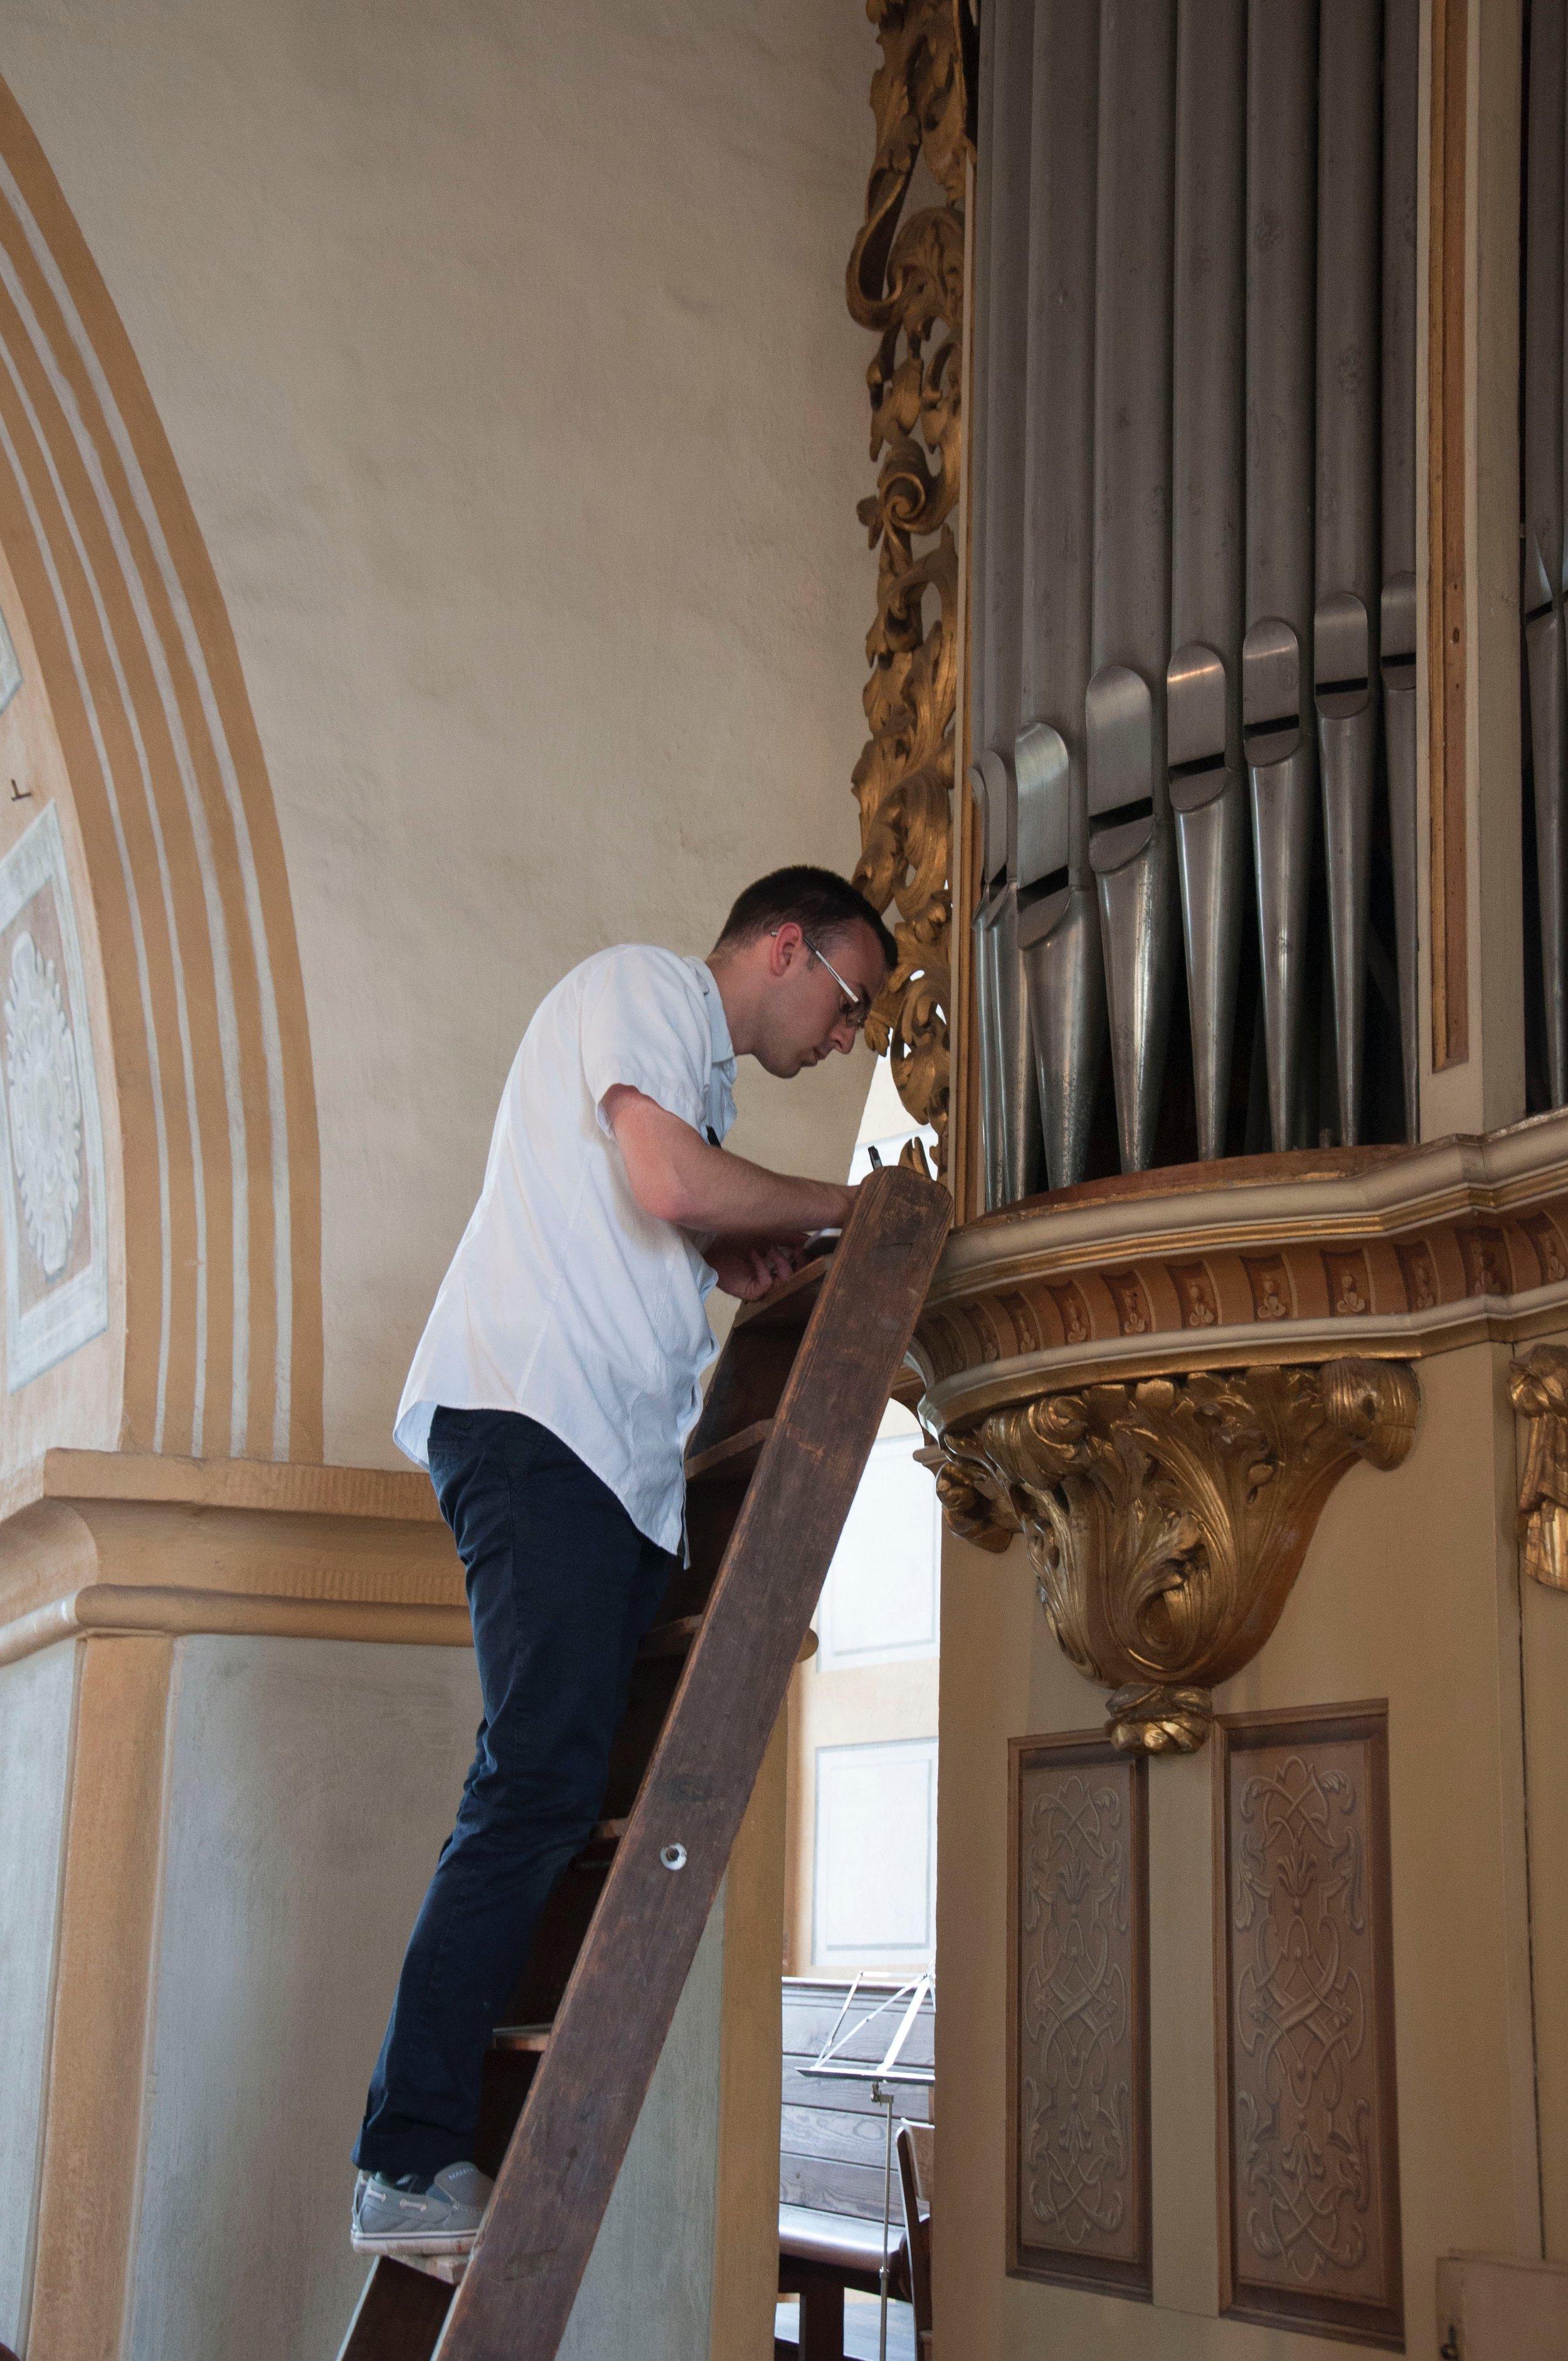 Kade Phillips noting pipe measurements of a Silbermann Organ in Rötha, Germany, in 2016.